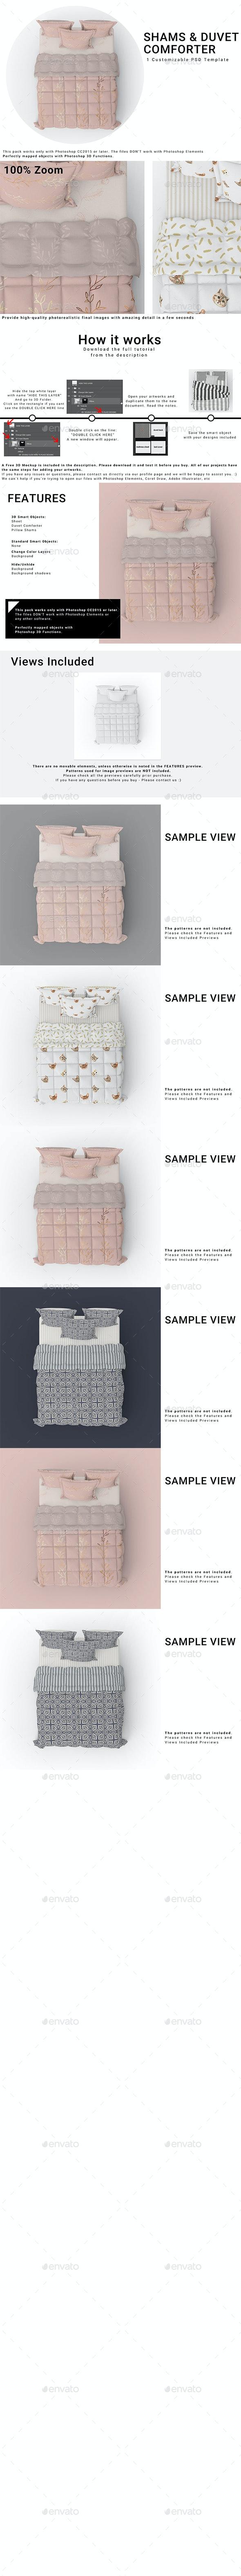 Duvet Comforter and Shams Mockup Set - Print Product Mock-Ups